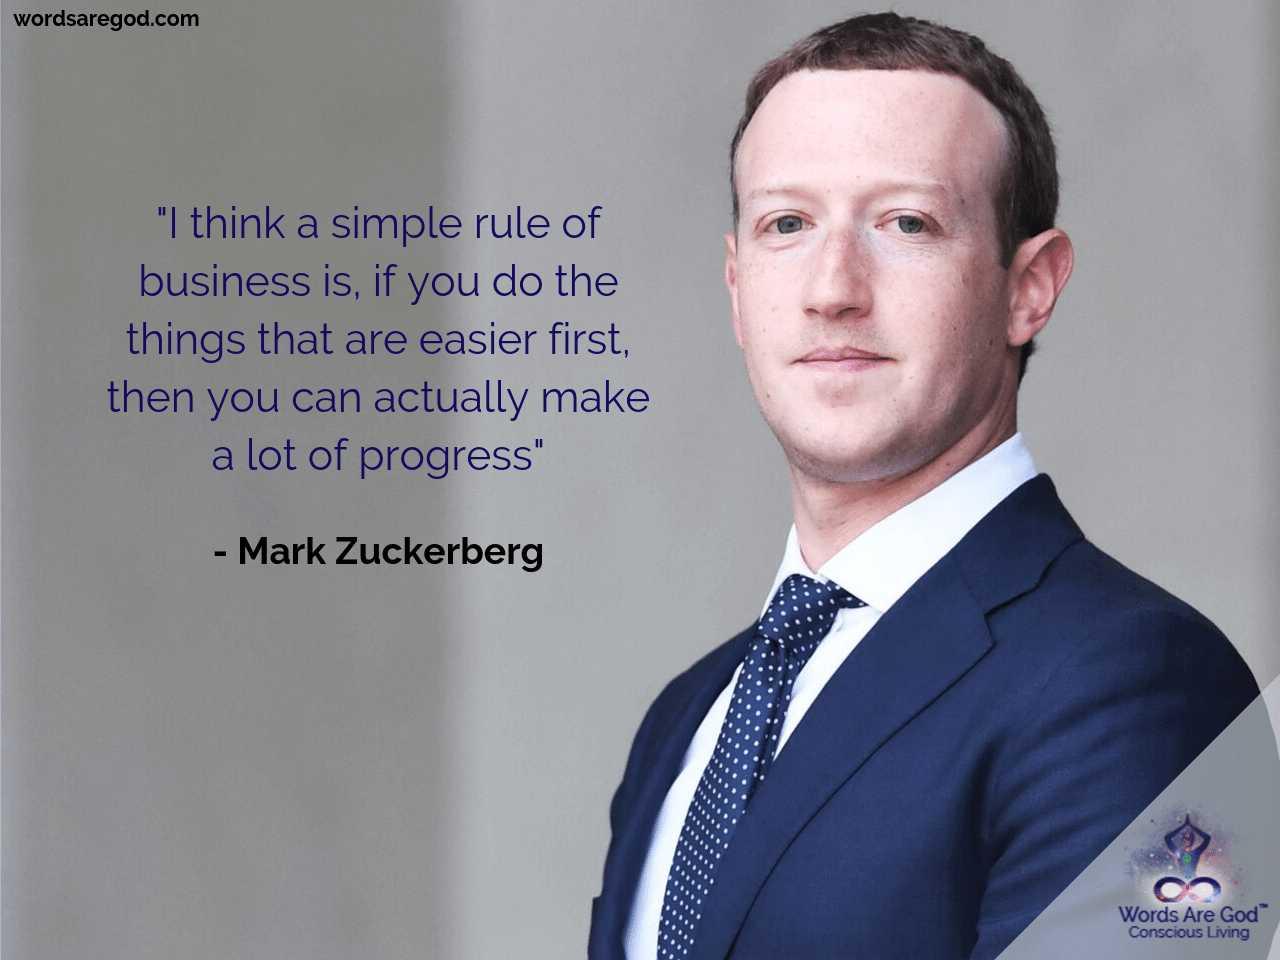 Mark Zuckerberg Motivational Quote